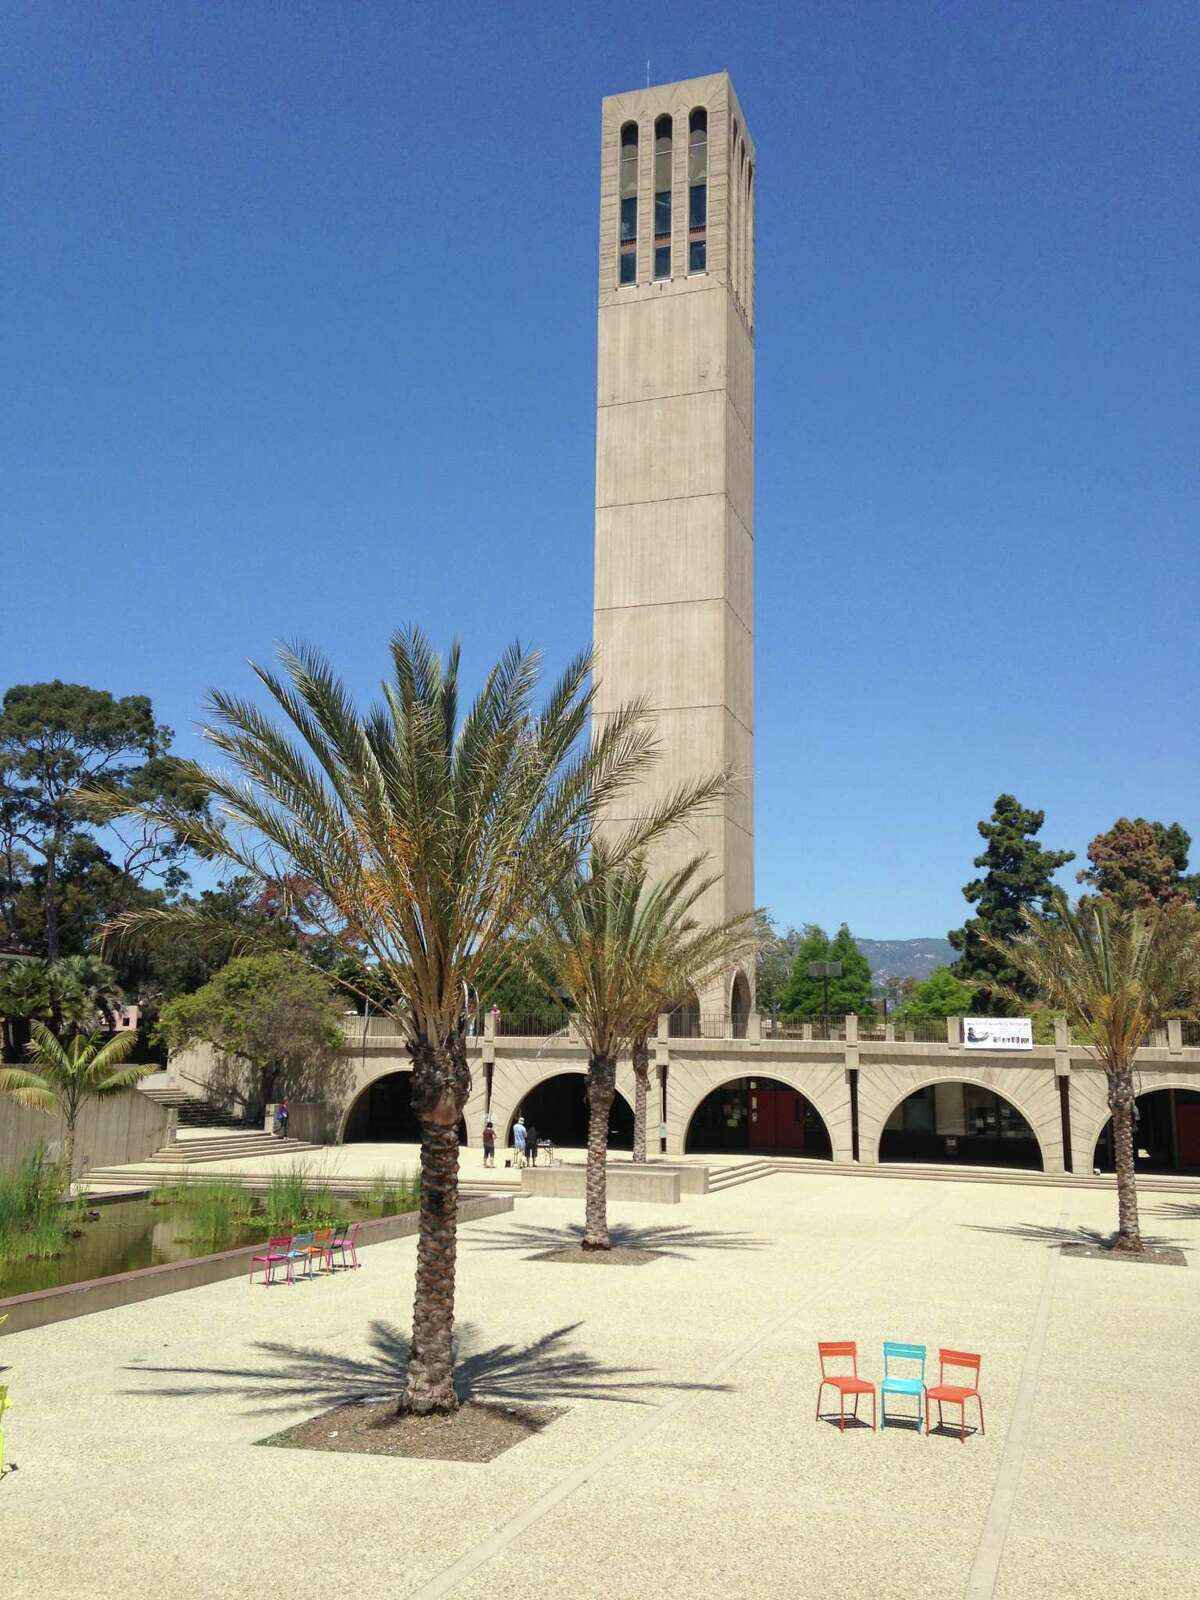 UC Santa Barbara 1997 - Applied: 20,710   Admitted: 14,766  Acceptance rate: 71.2 percent 2007 - Applied: 40,937   Admitted: 22,271  Acceptance rate: 54.4 percent 2017 - Applied: 81,824   Admitted: 26,845  Acceptance rate: 32.8 percent